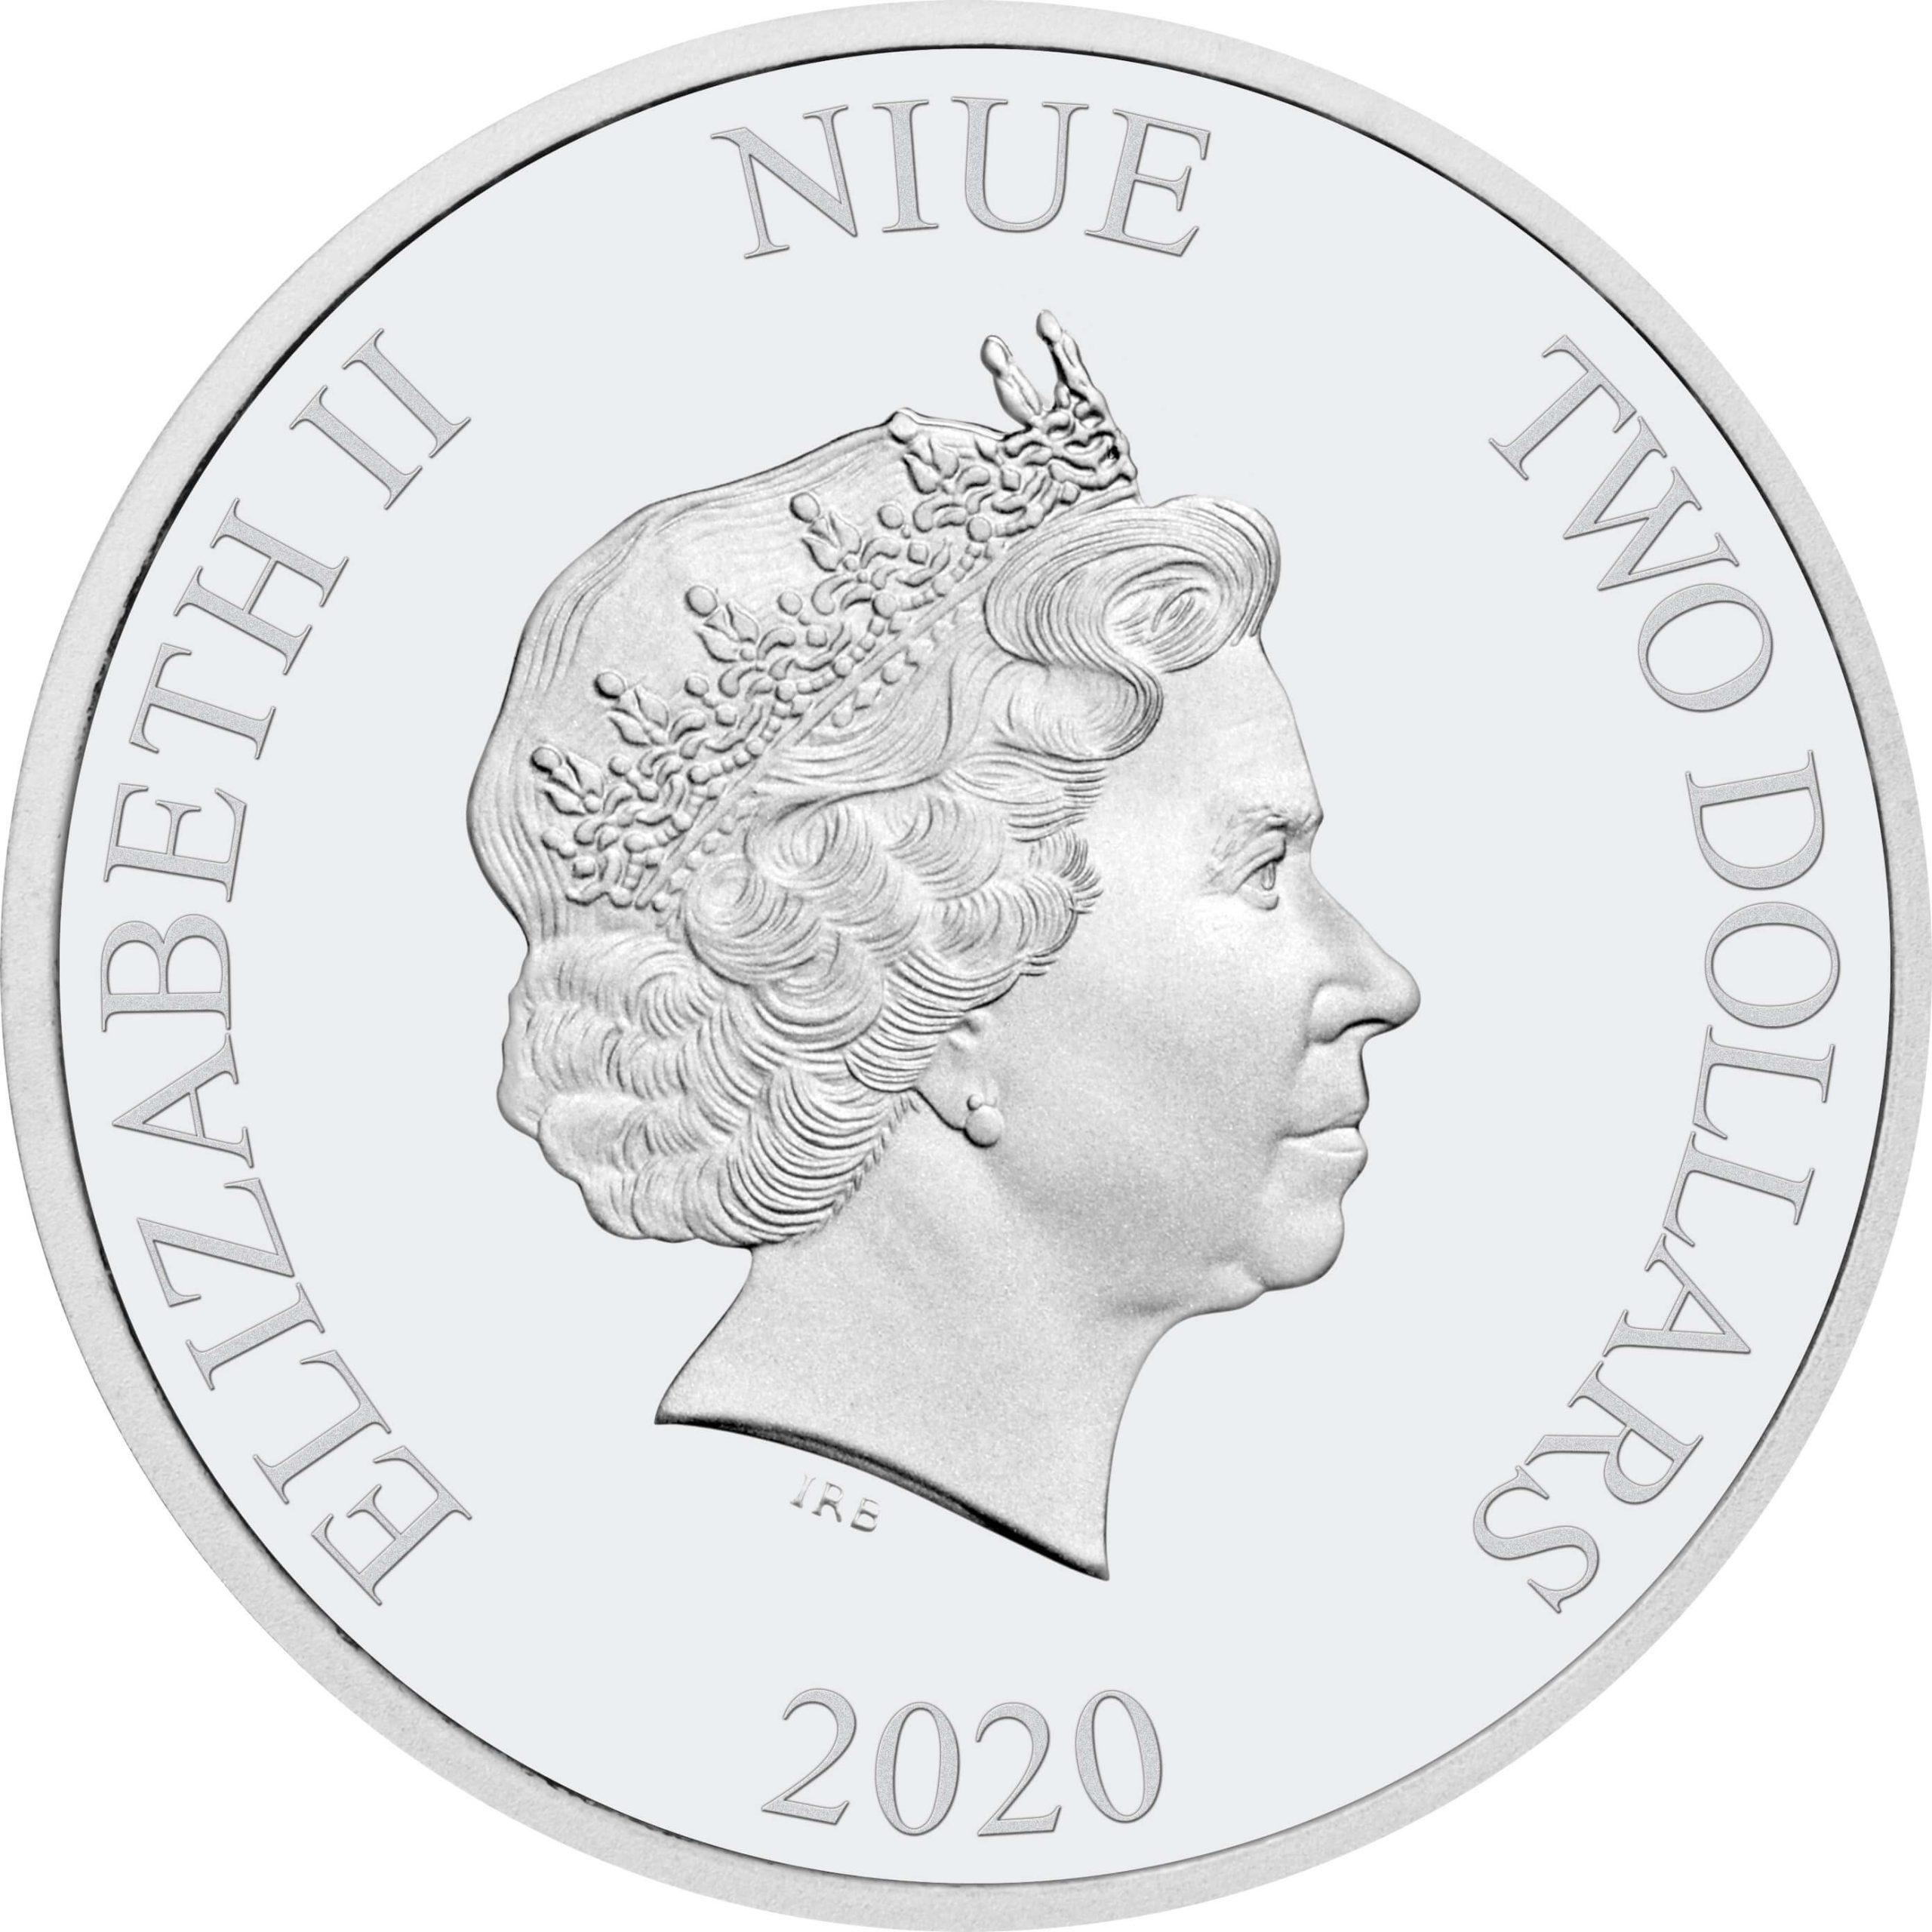 2020 Star Wars - Darth Vader 1oz .999 Silver Bullion Coin 3